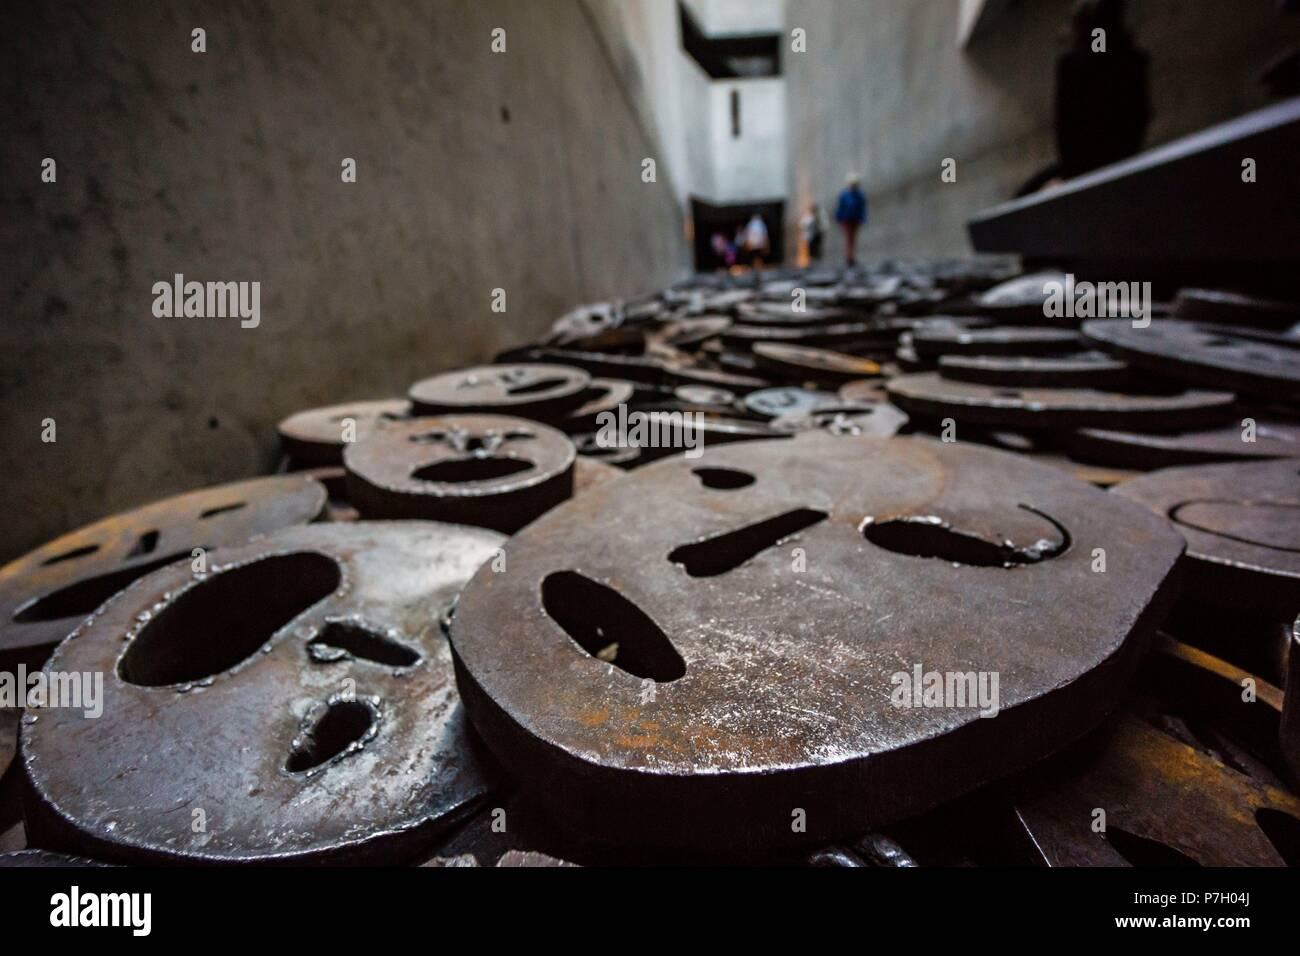 Shalechet, -hojas caidas-, instalacion artistica de Menashe Kadishman, Museo Judío de Berlín,diseñado por el arquitecto polaco Daniel Libeskinds , Berlin, Alemania, Europe. Stock Photo